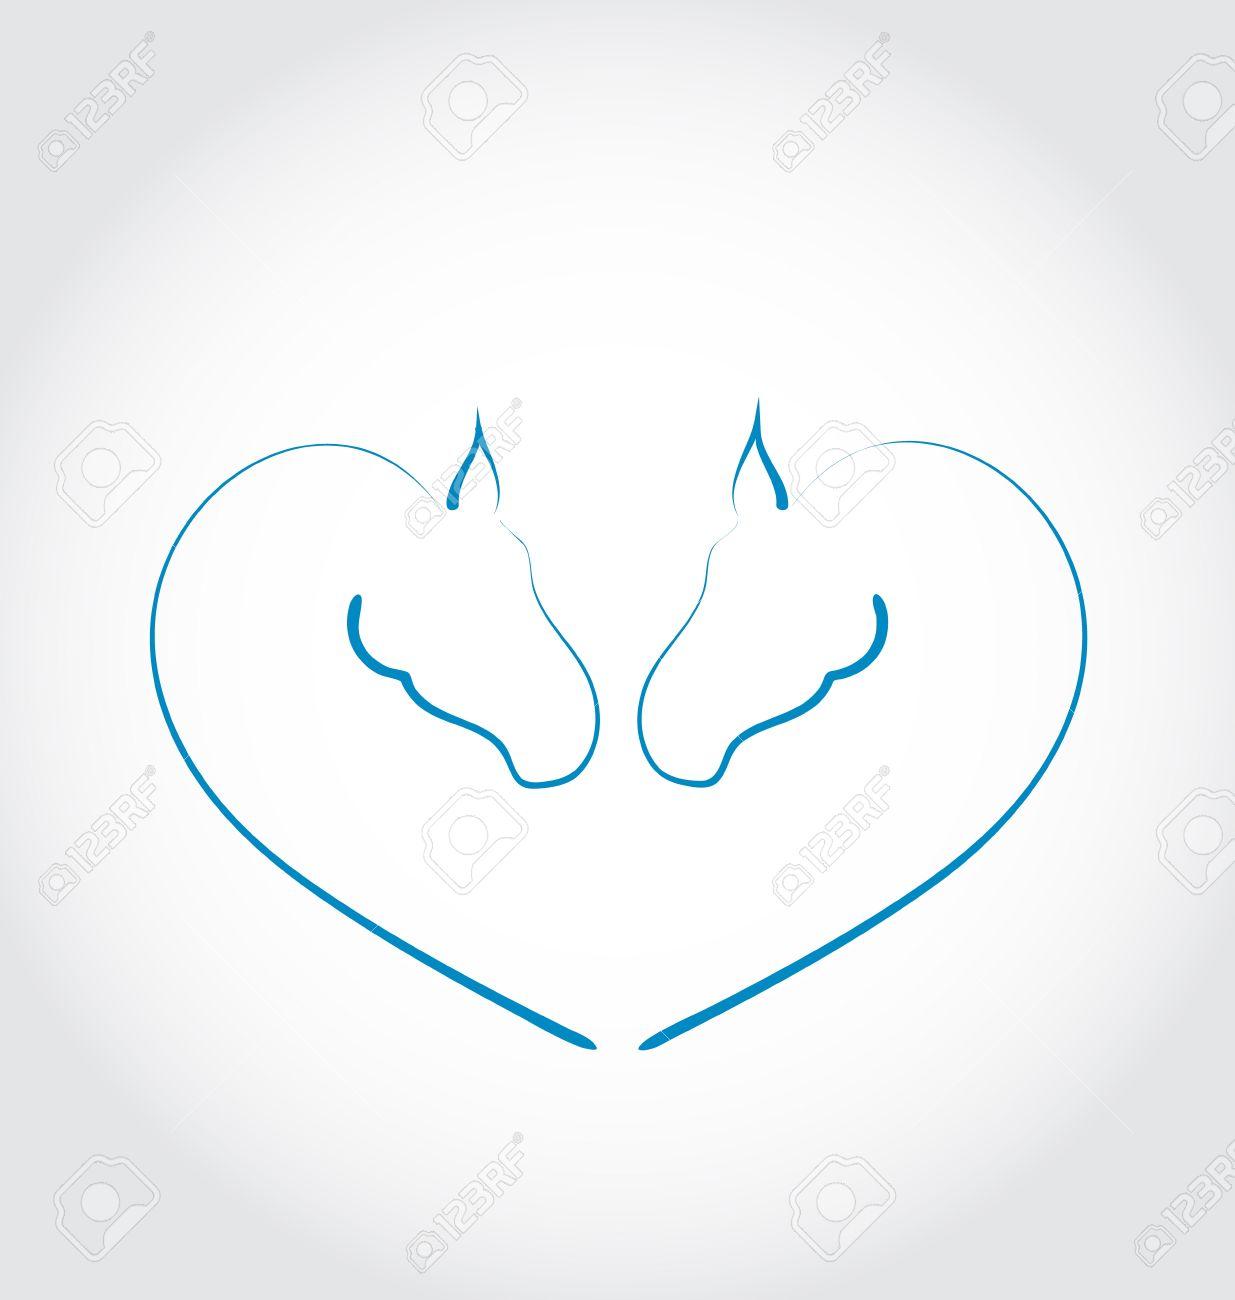 Illustration two horses stylized heart shape - vector Stock Illustration - 22096332